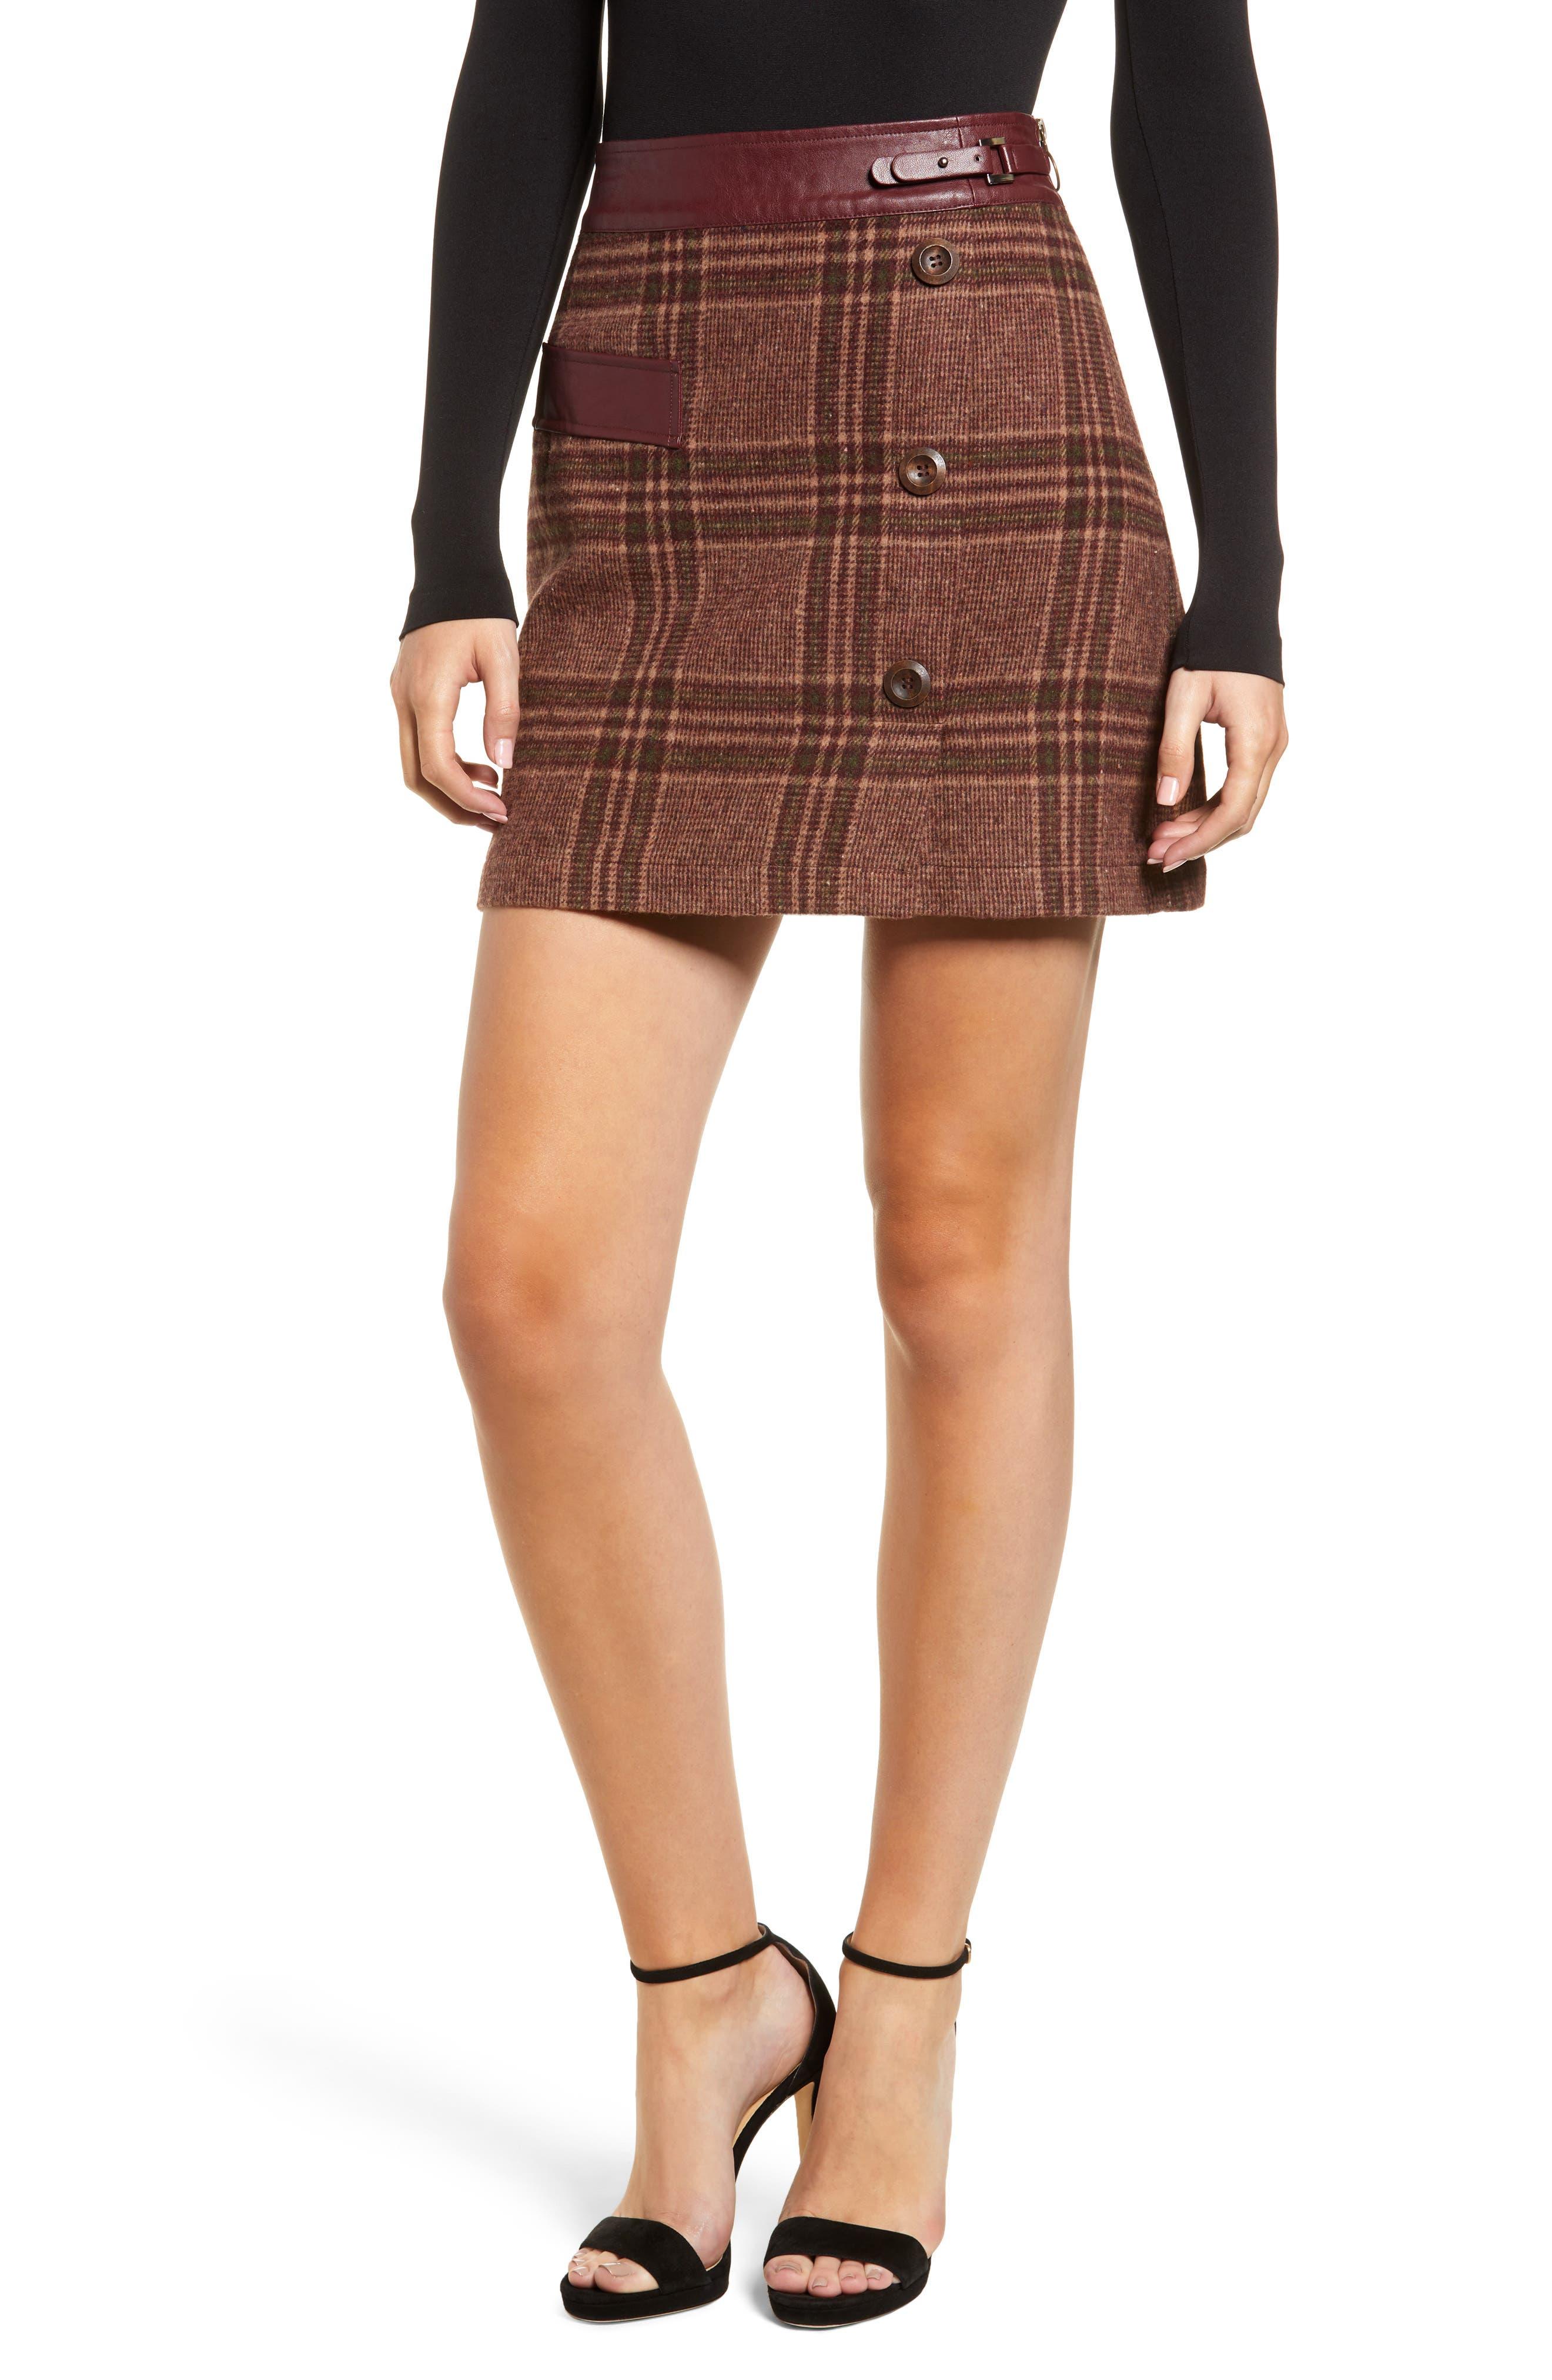 MOON RIVER, Plaid Miniskirt, Main thumbnail 1, color, 200